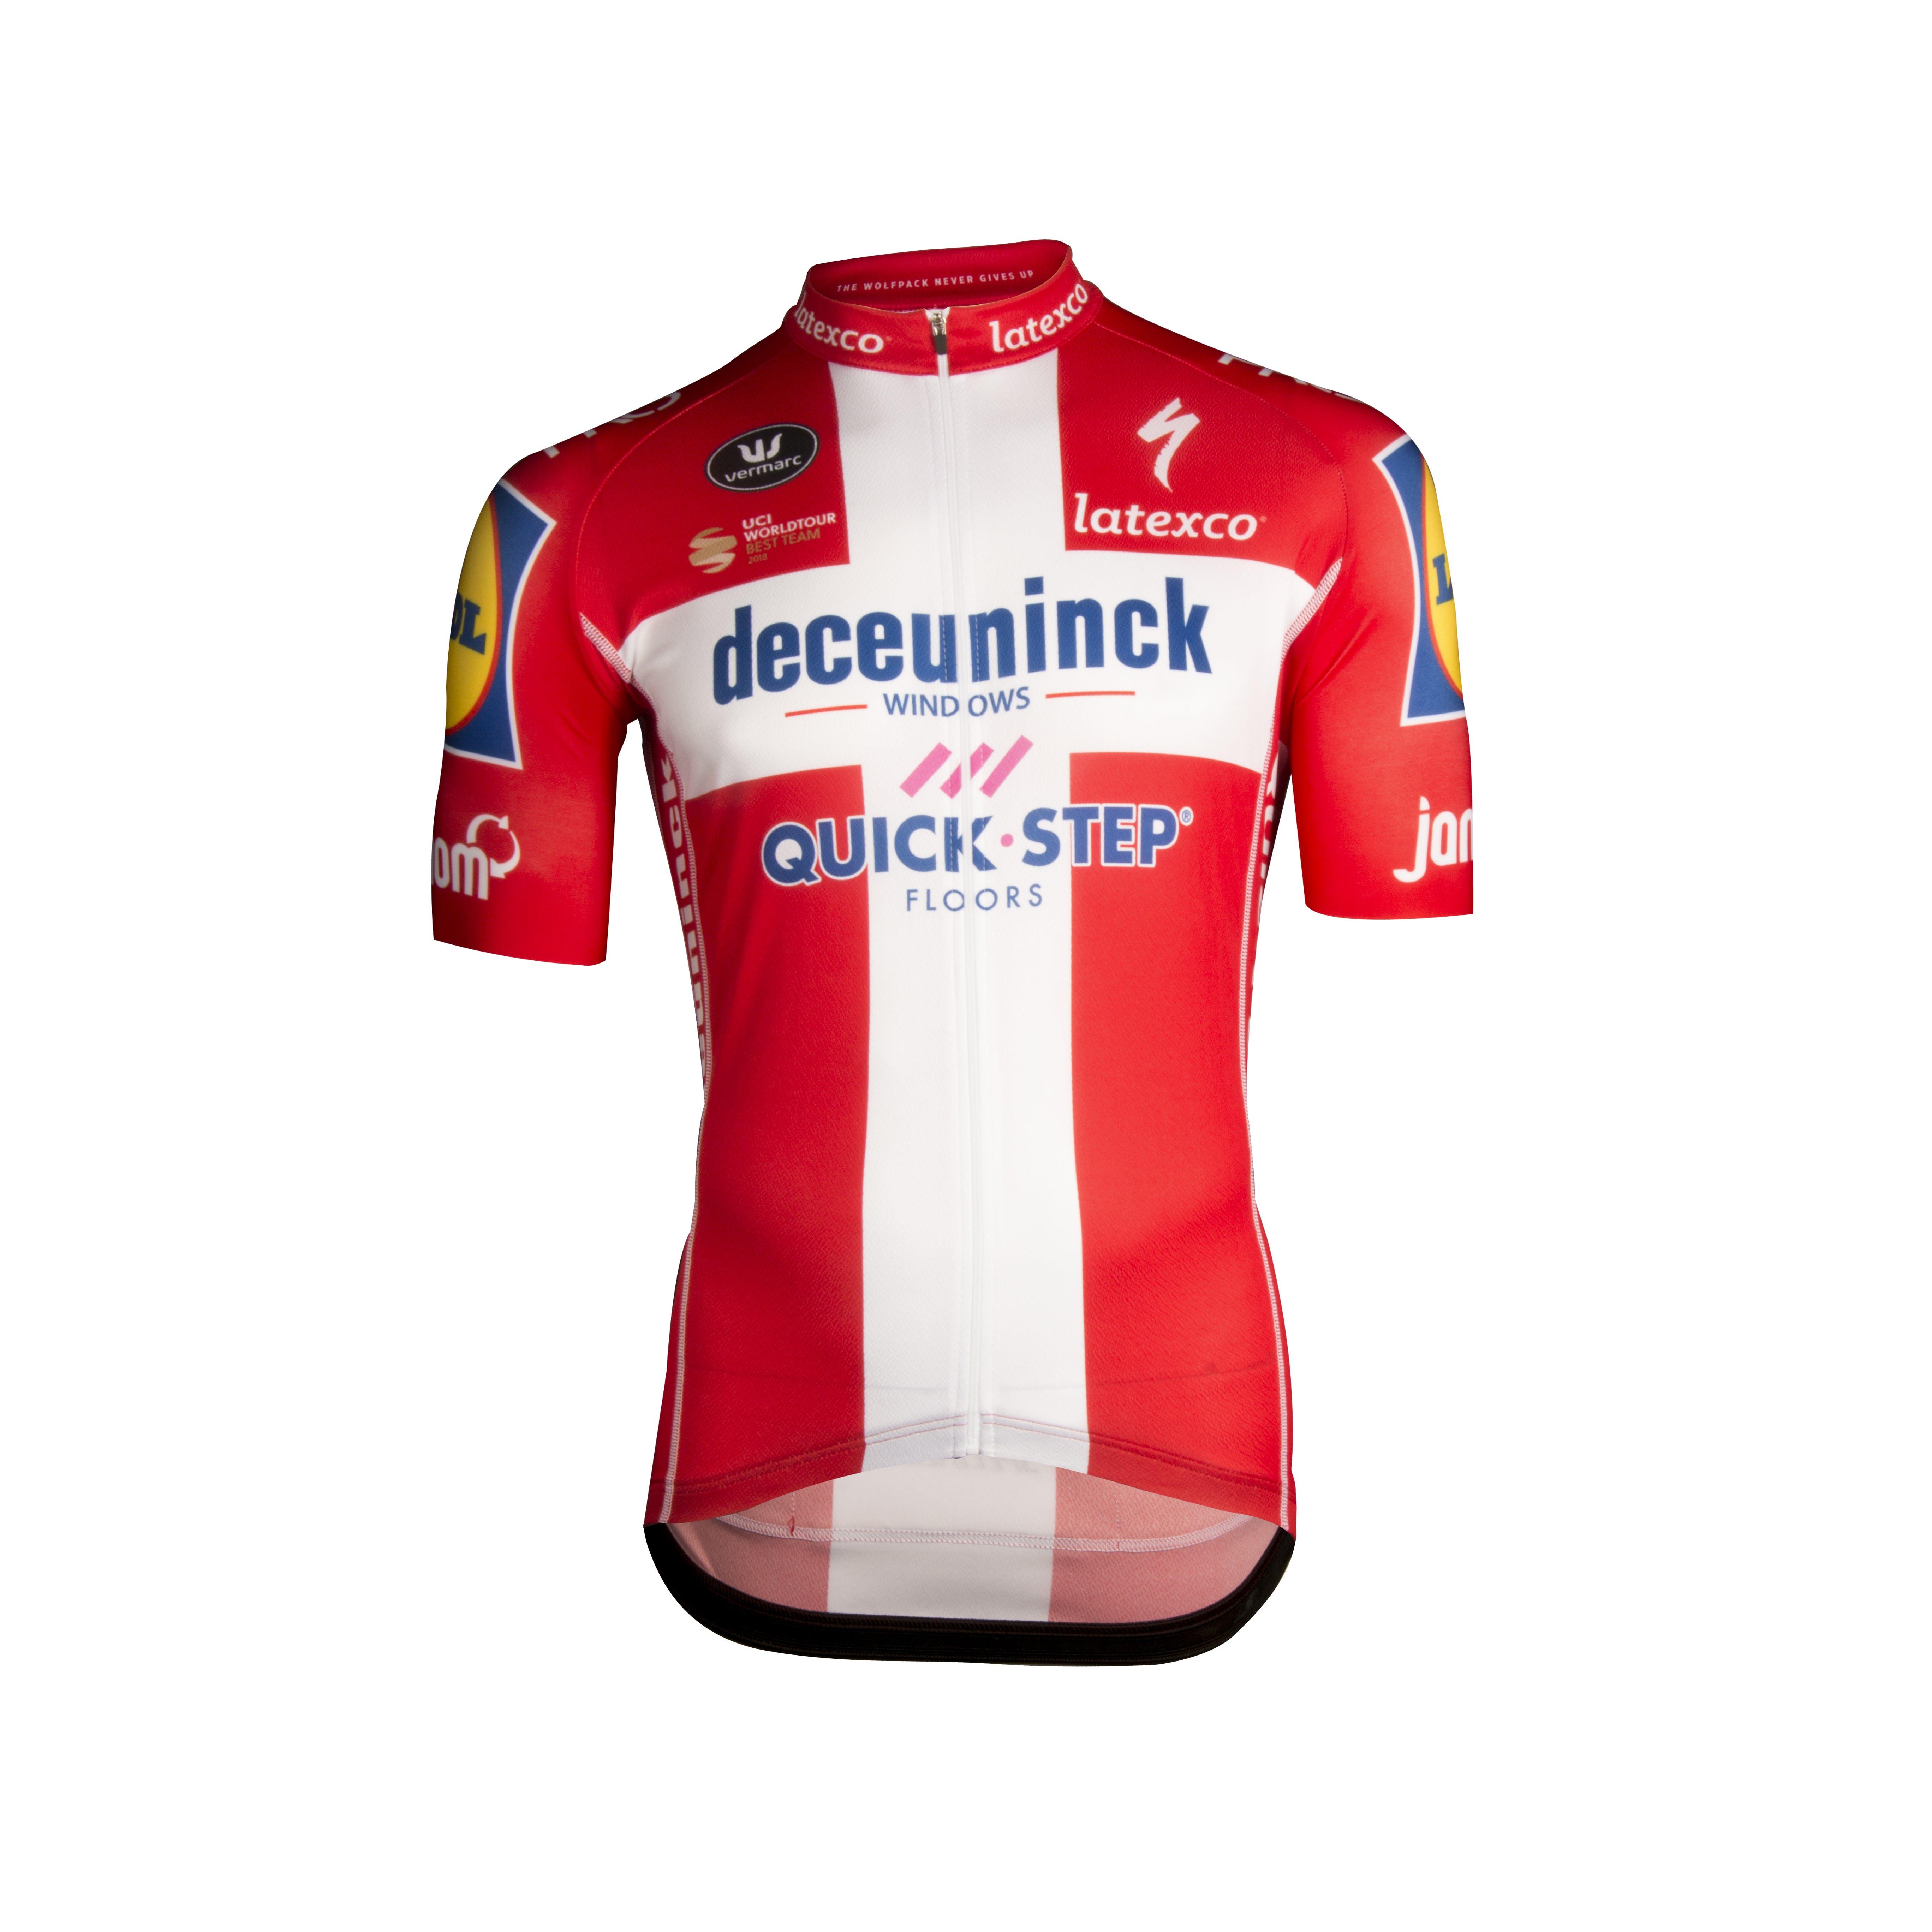 Deceuninck Quick-Step Champion Denmark Maillot Manches Courtes Aero